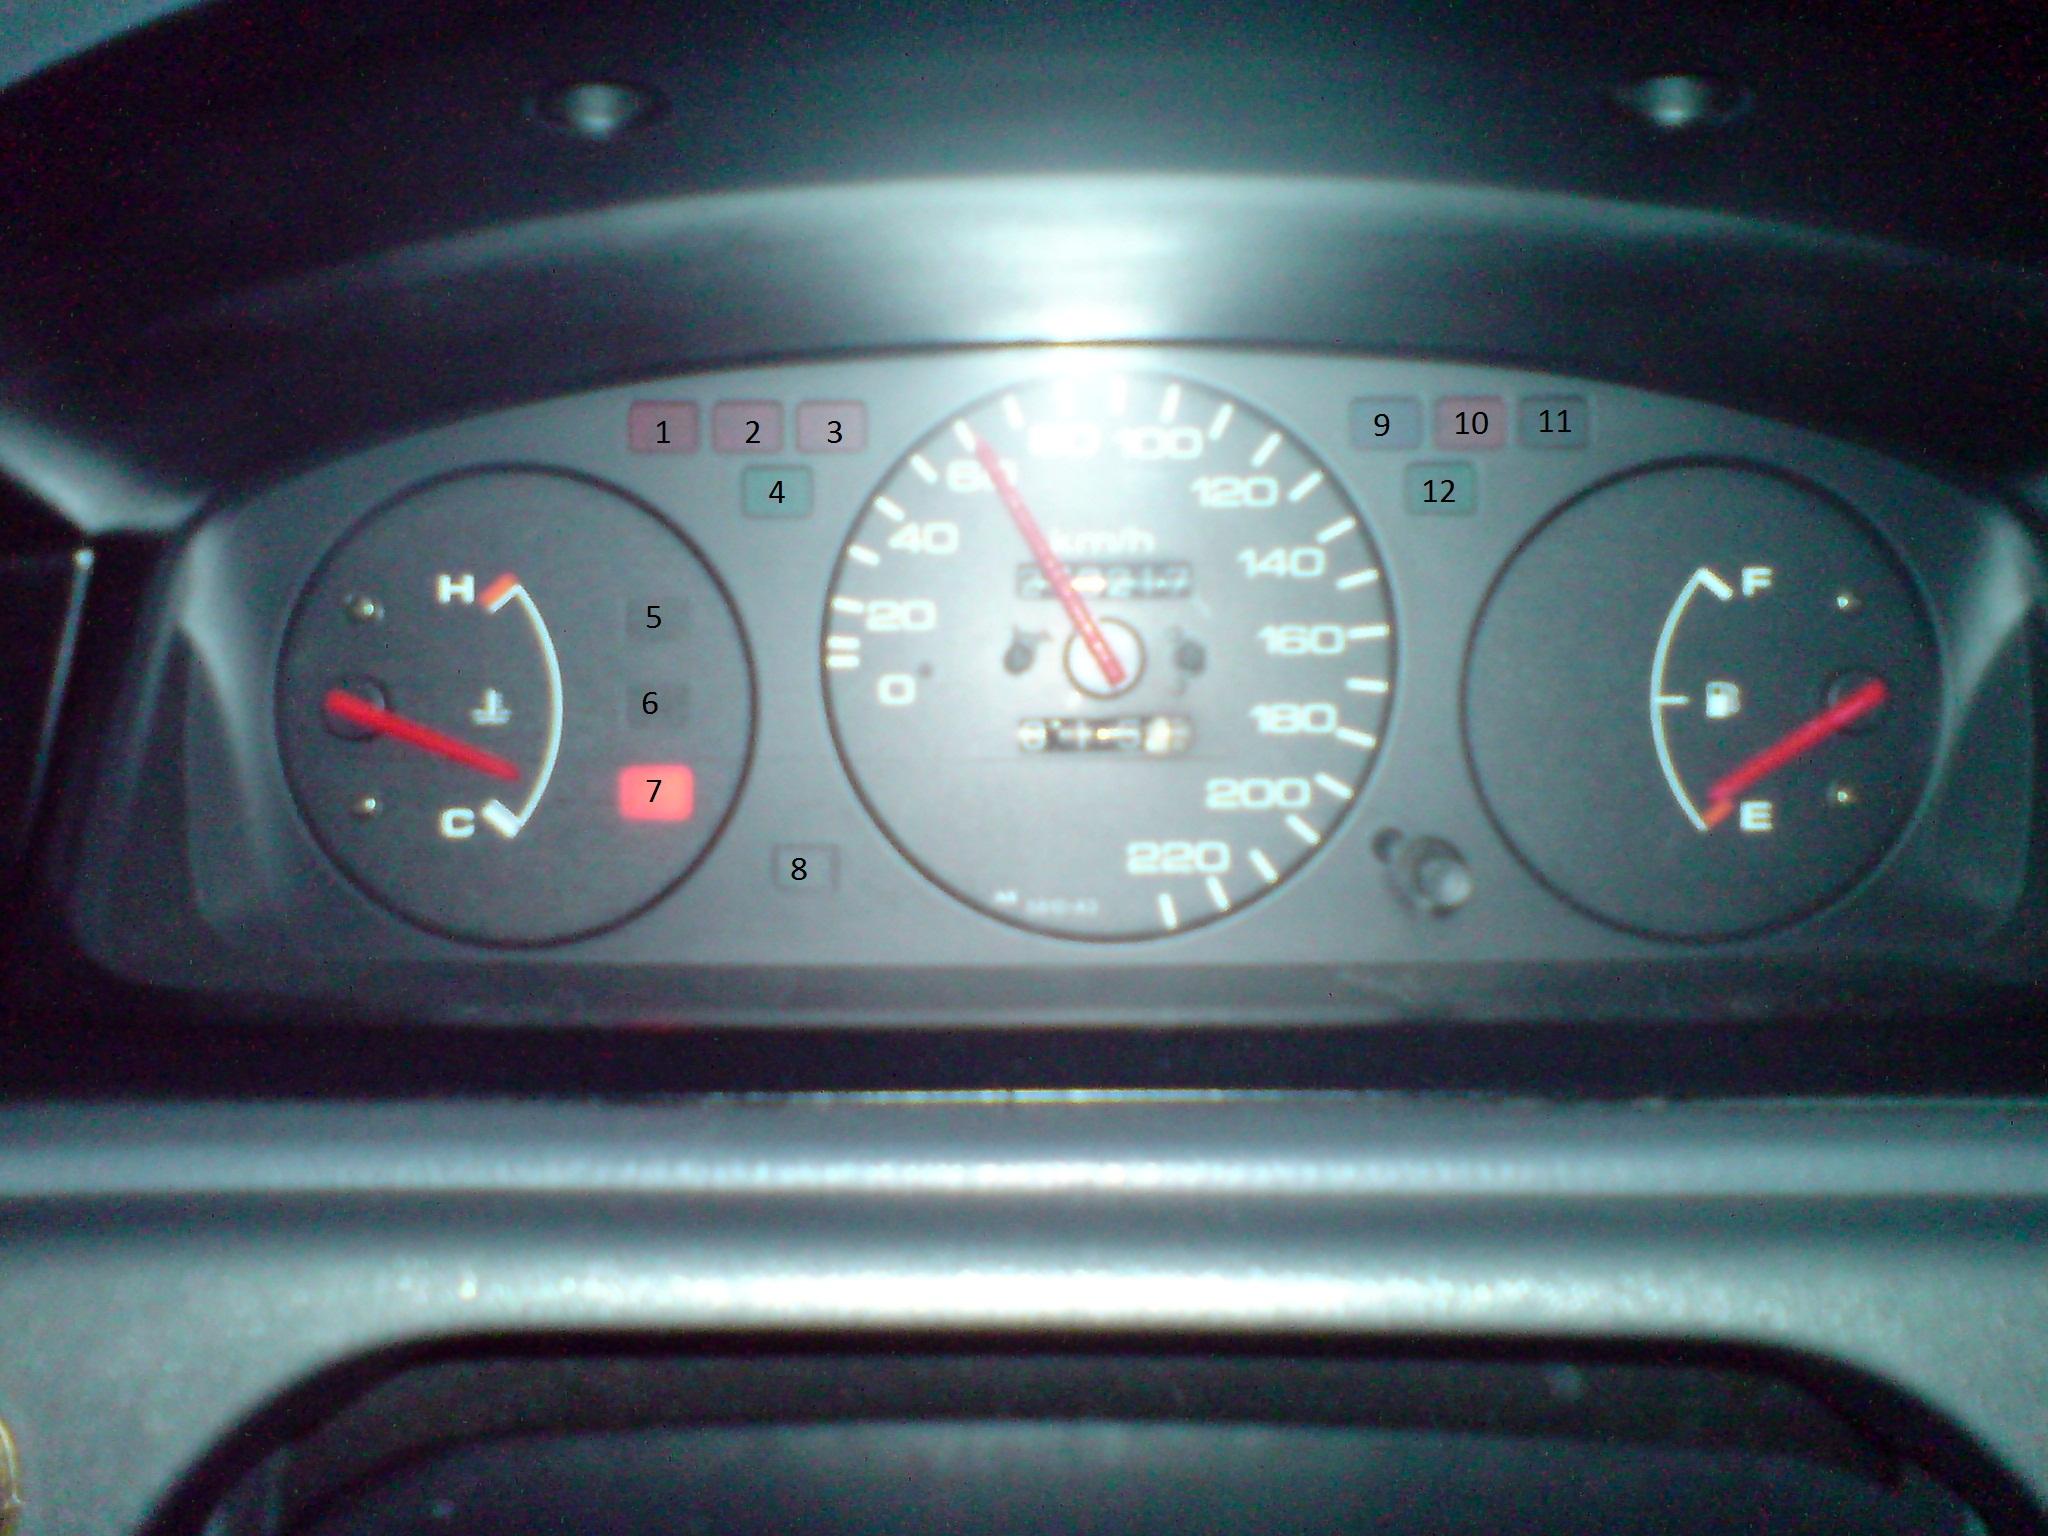 Honda Civic V 1.3 16v - Nieznane kontrolki na tablicy rozdzielczej (zegarach)